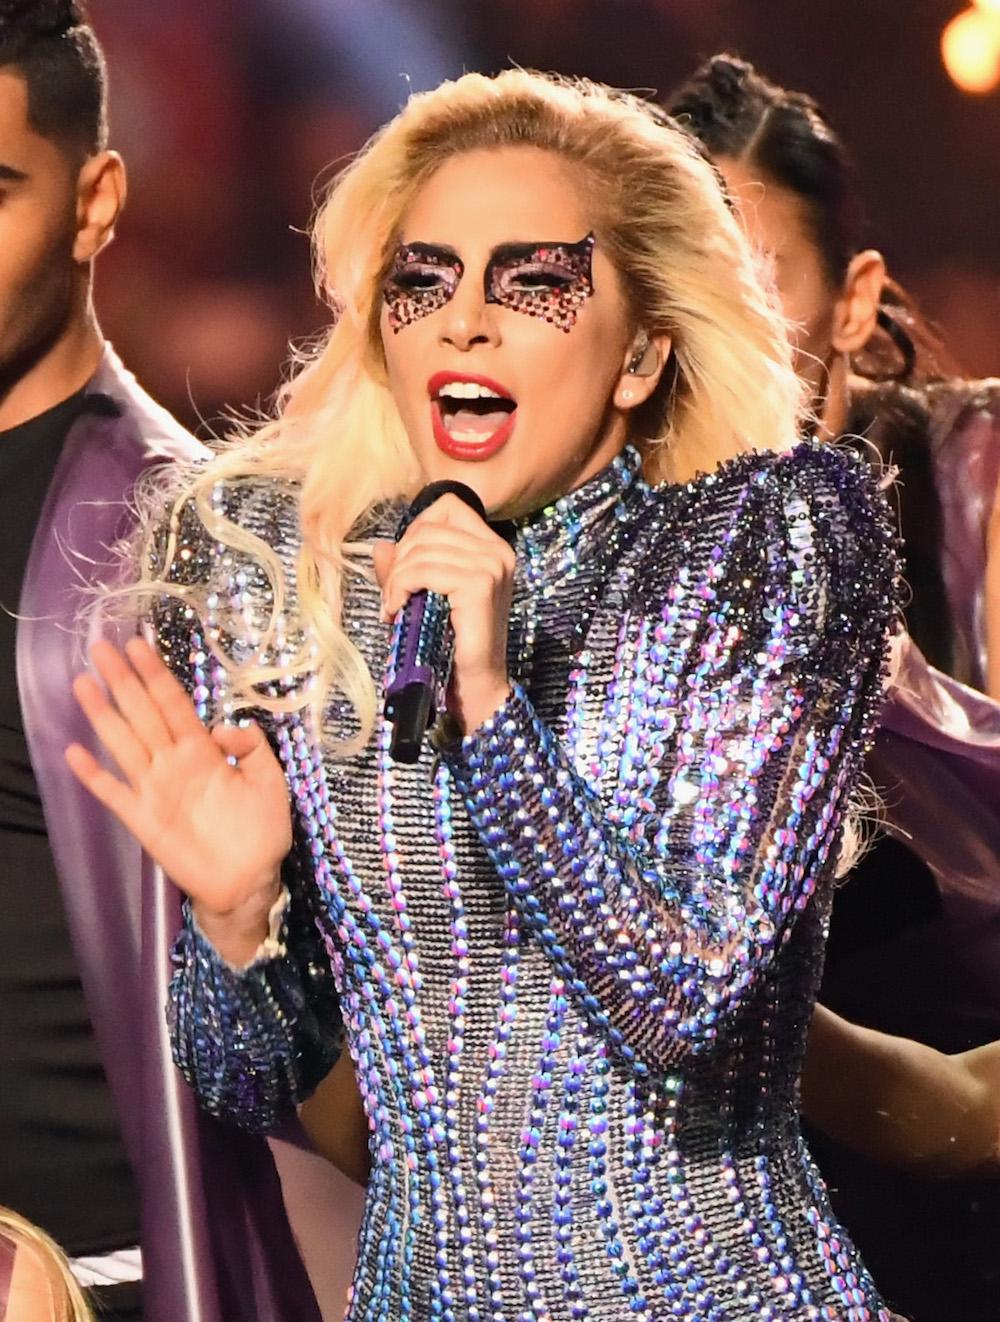 Lady-Gaga-Superbowl-2.jpg